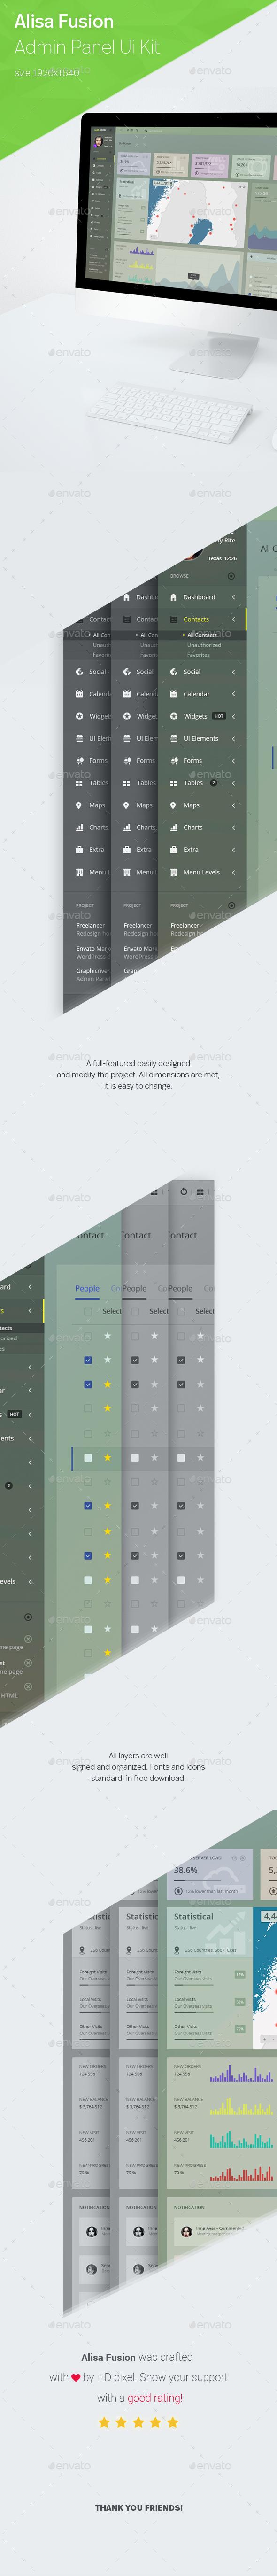 Alisa Fusion - Responsive Admin Template  - User Interfaces Web Elements